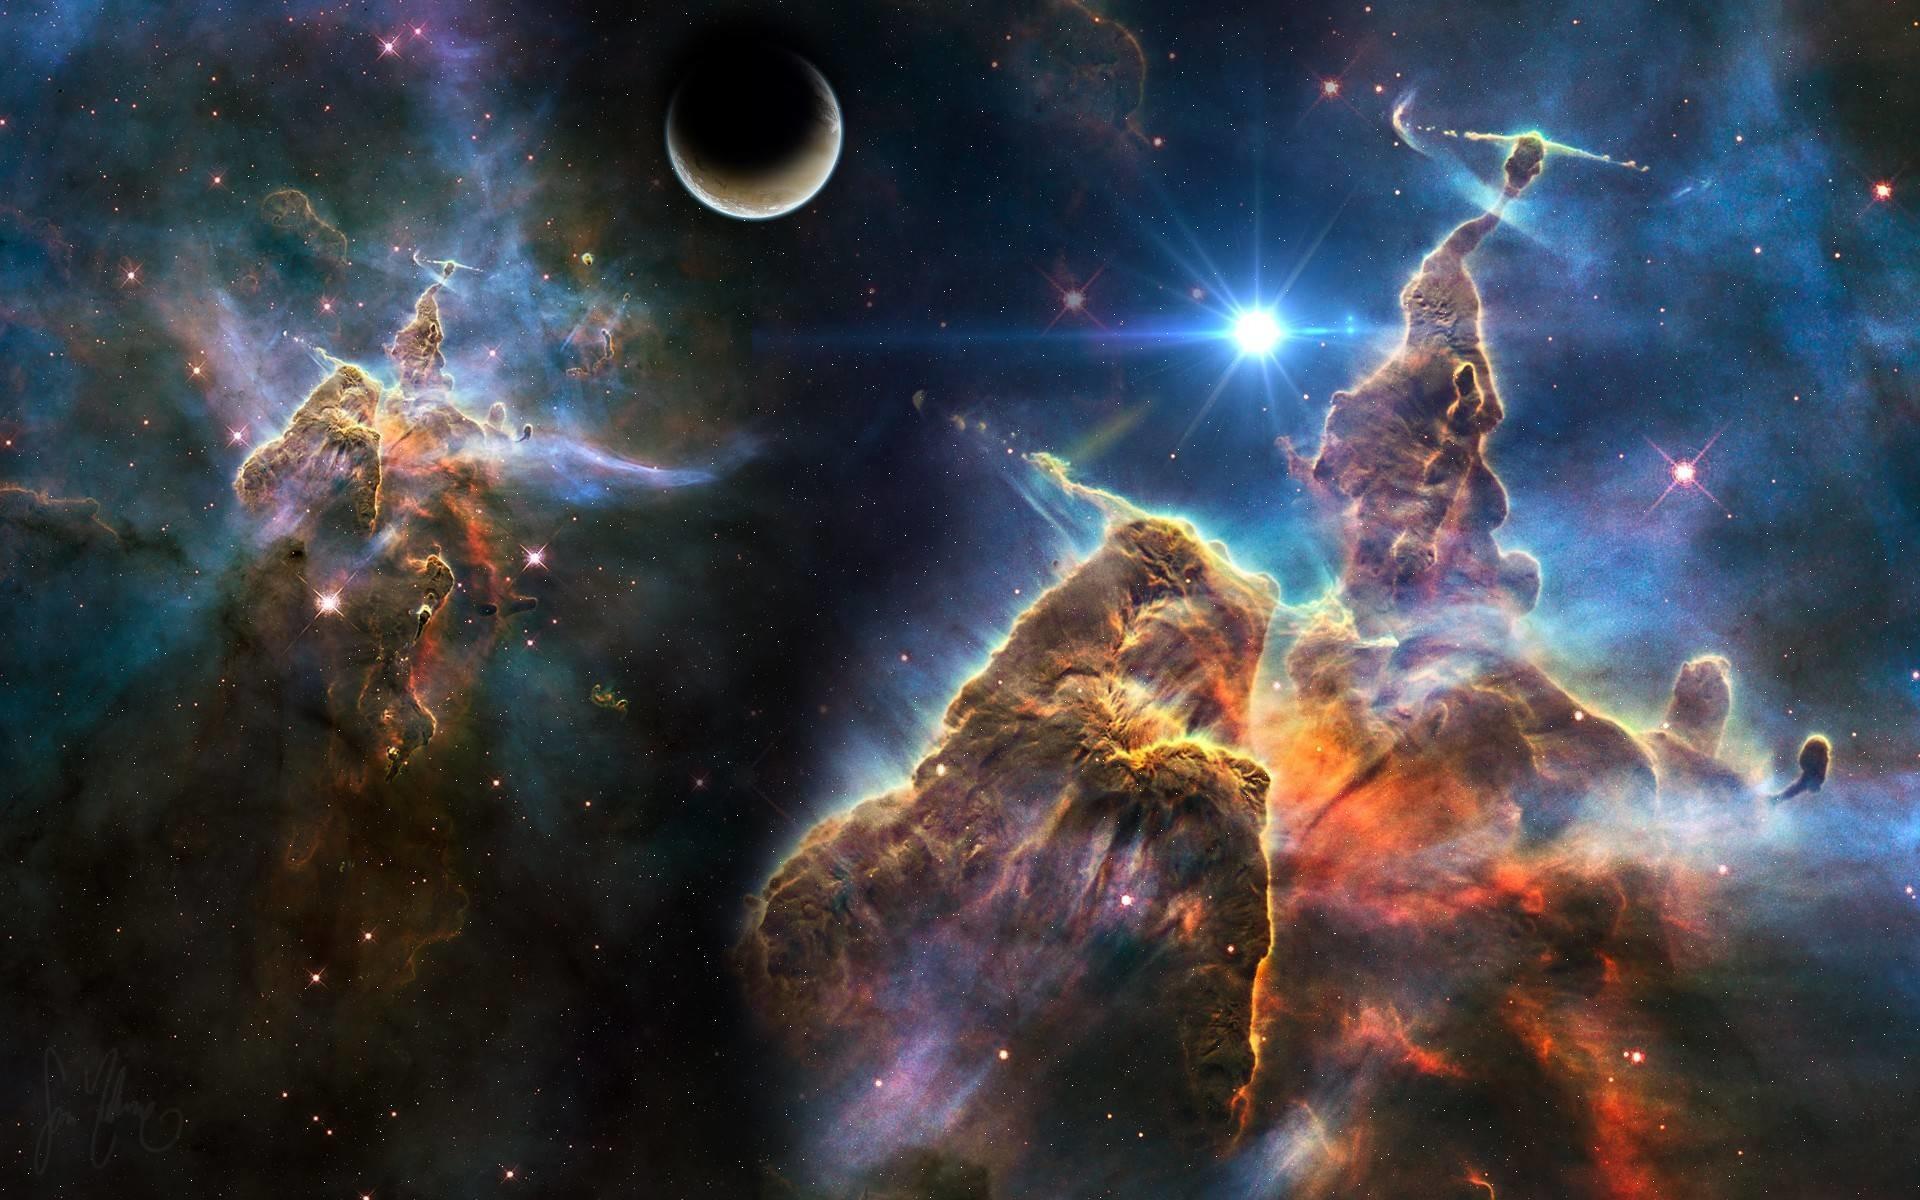 nasa wallpaper 1 – NASA Wallpaper